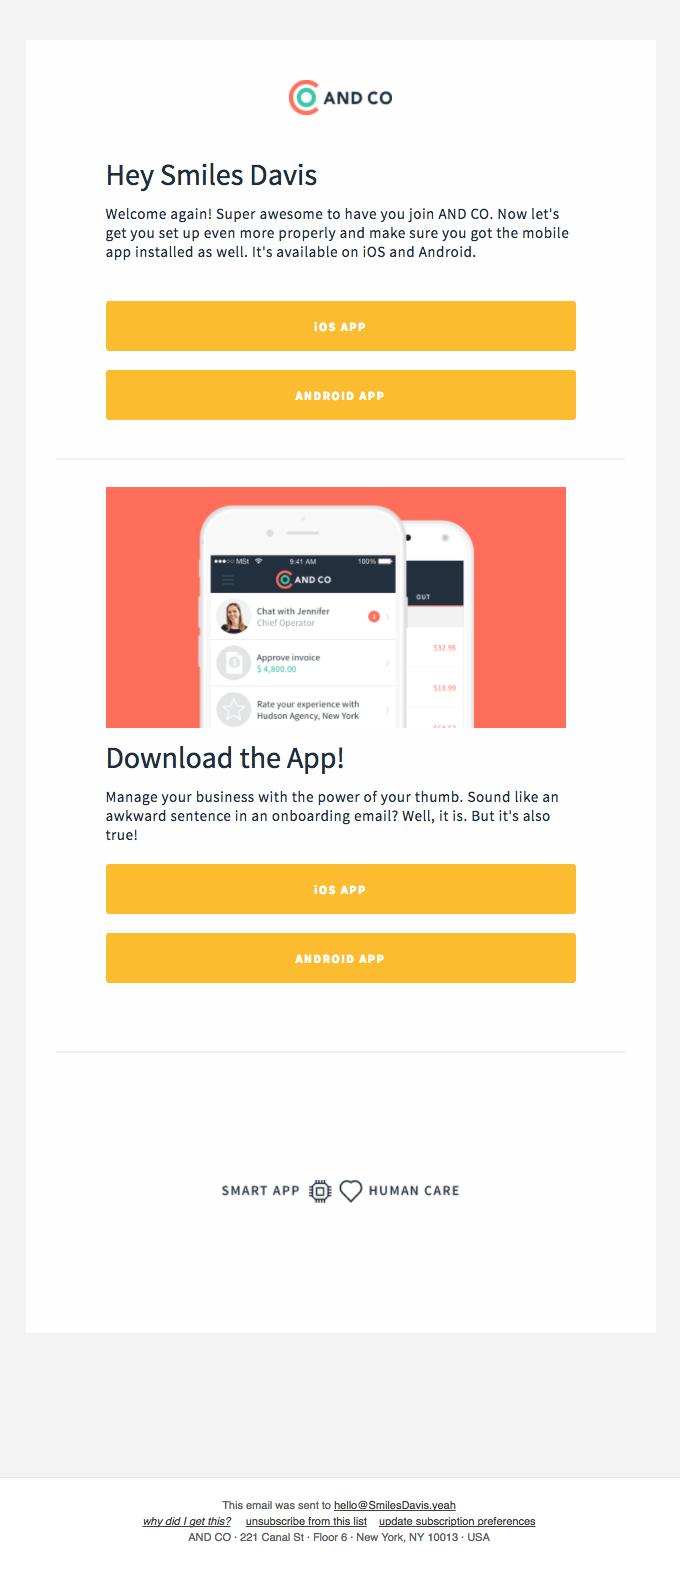 Smiles Davis, download the free app! ⚡⚡